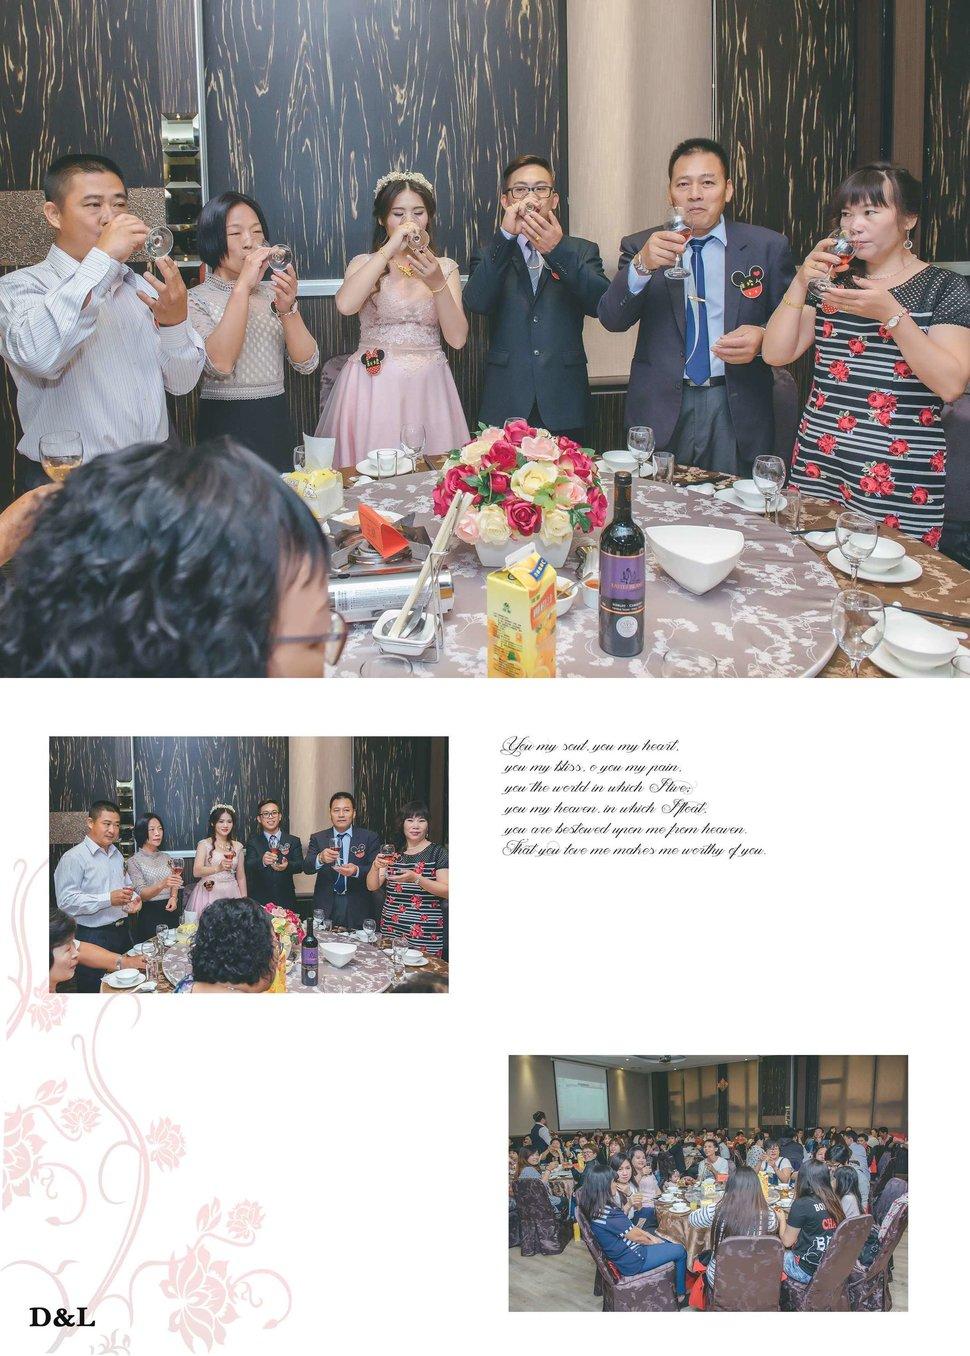 27 - D&L 婚禮事務 · 婚禮婚紗攝影 - 結婚吧